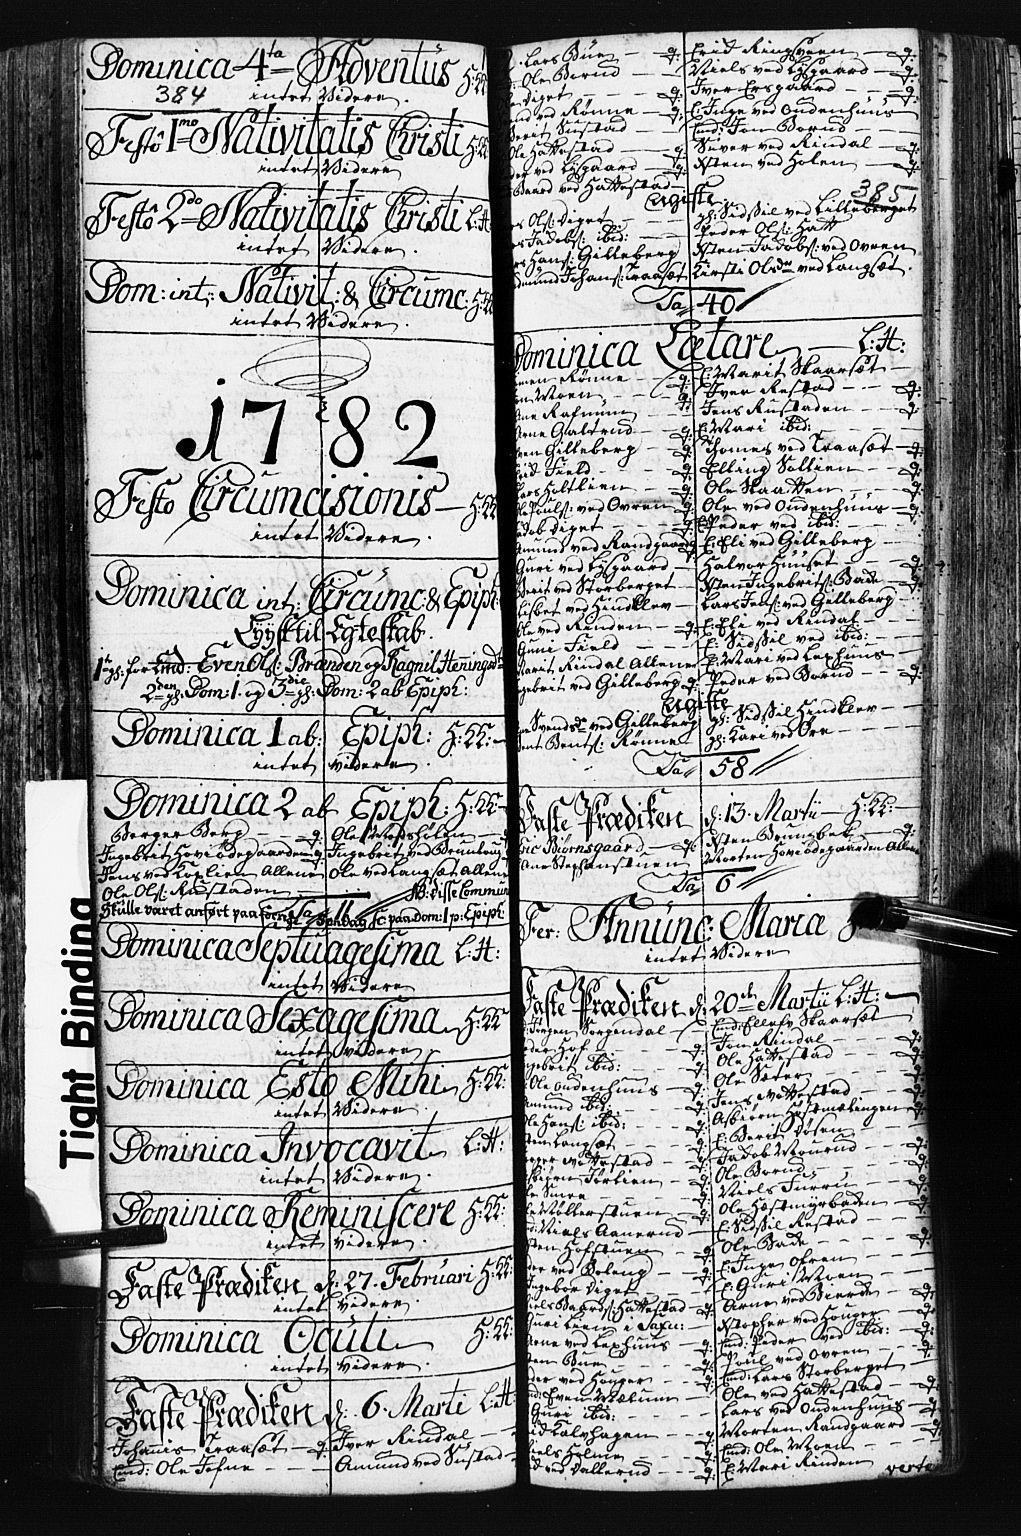 SAH, Fåberg prestekontor, Klokkerbok nr. 3, 1768-1796, s. 384-385